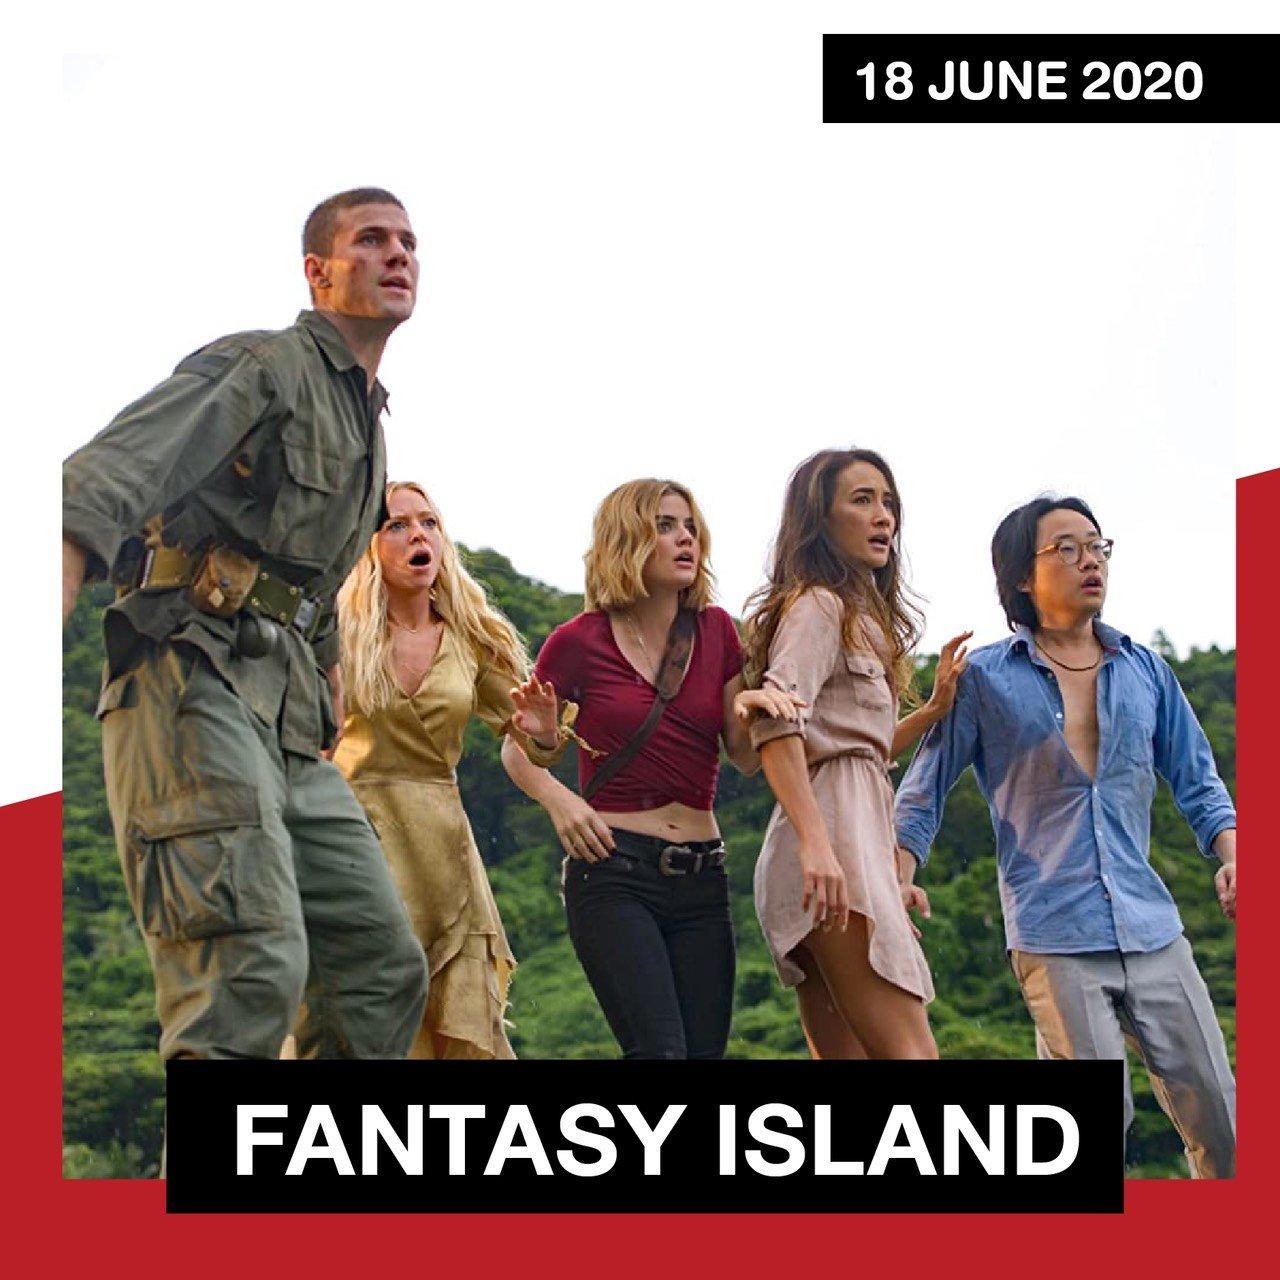 fantasyisland